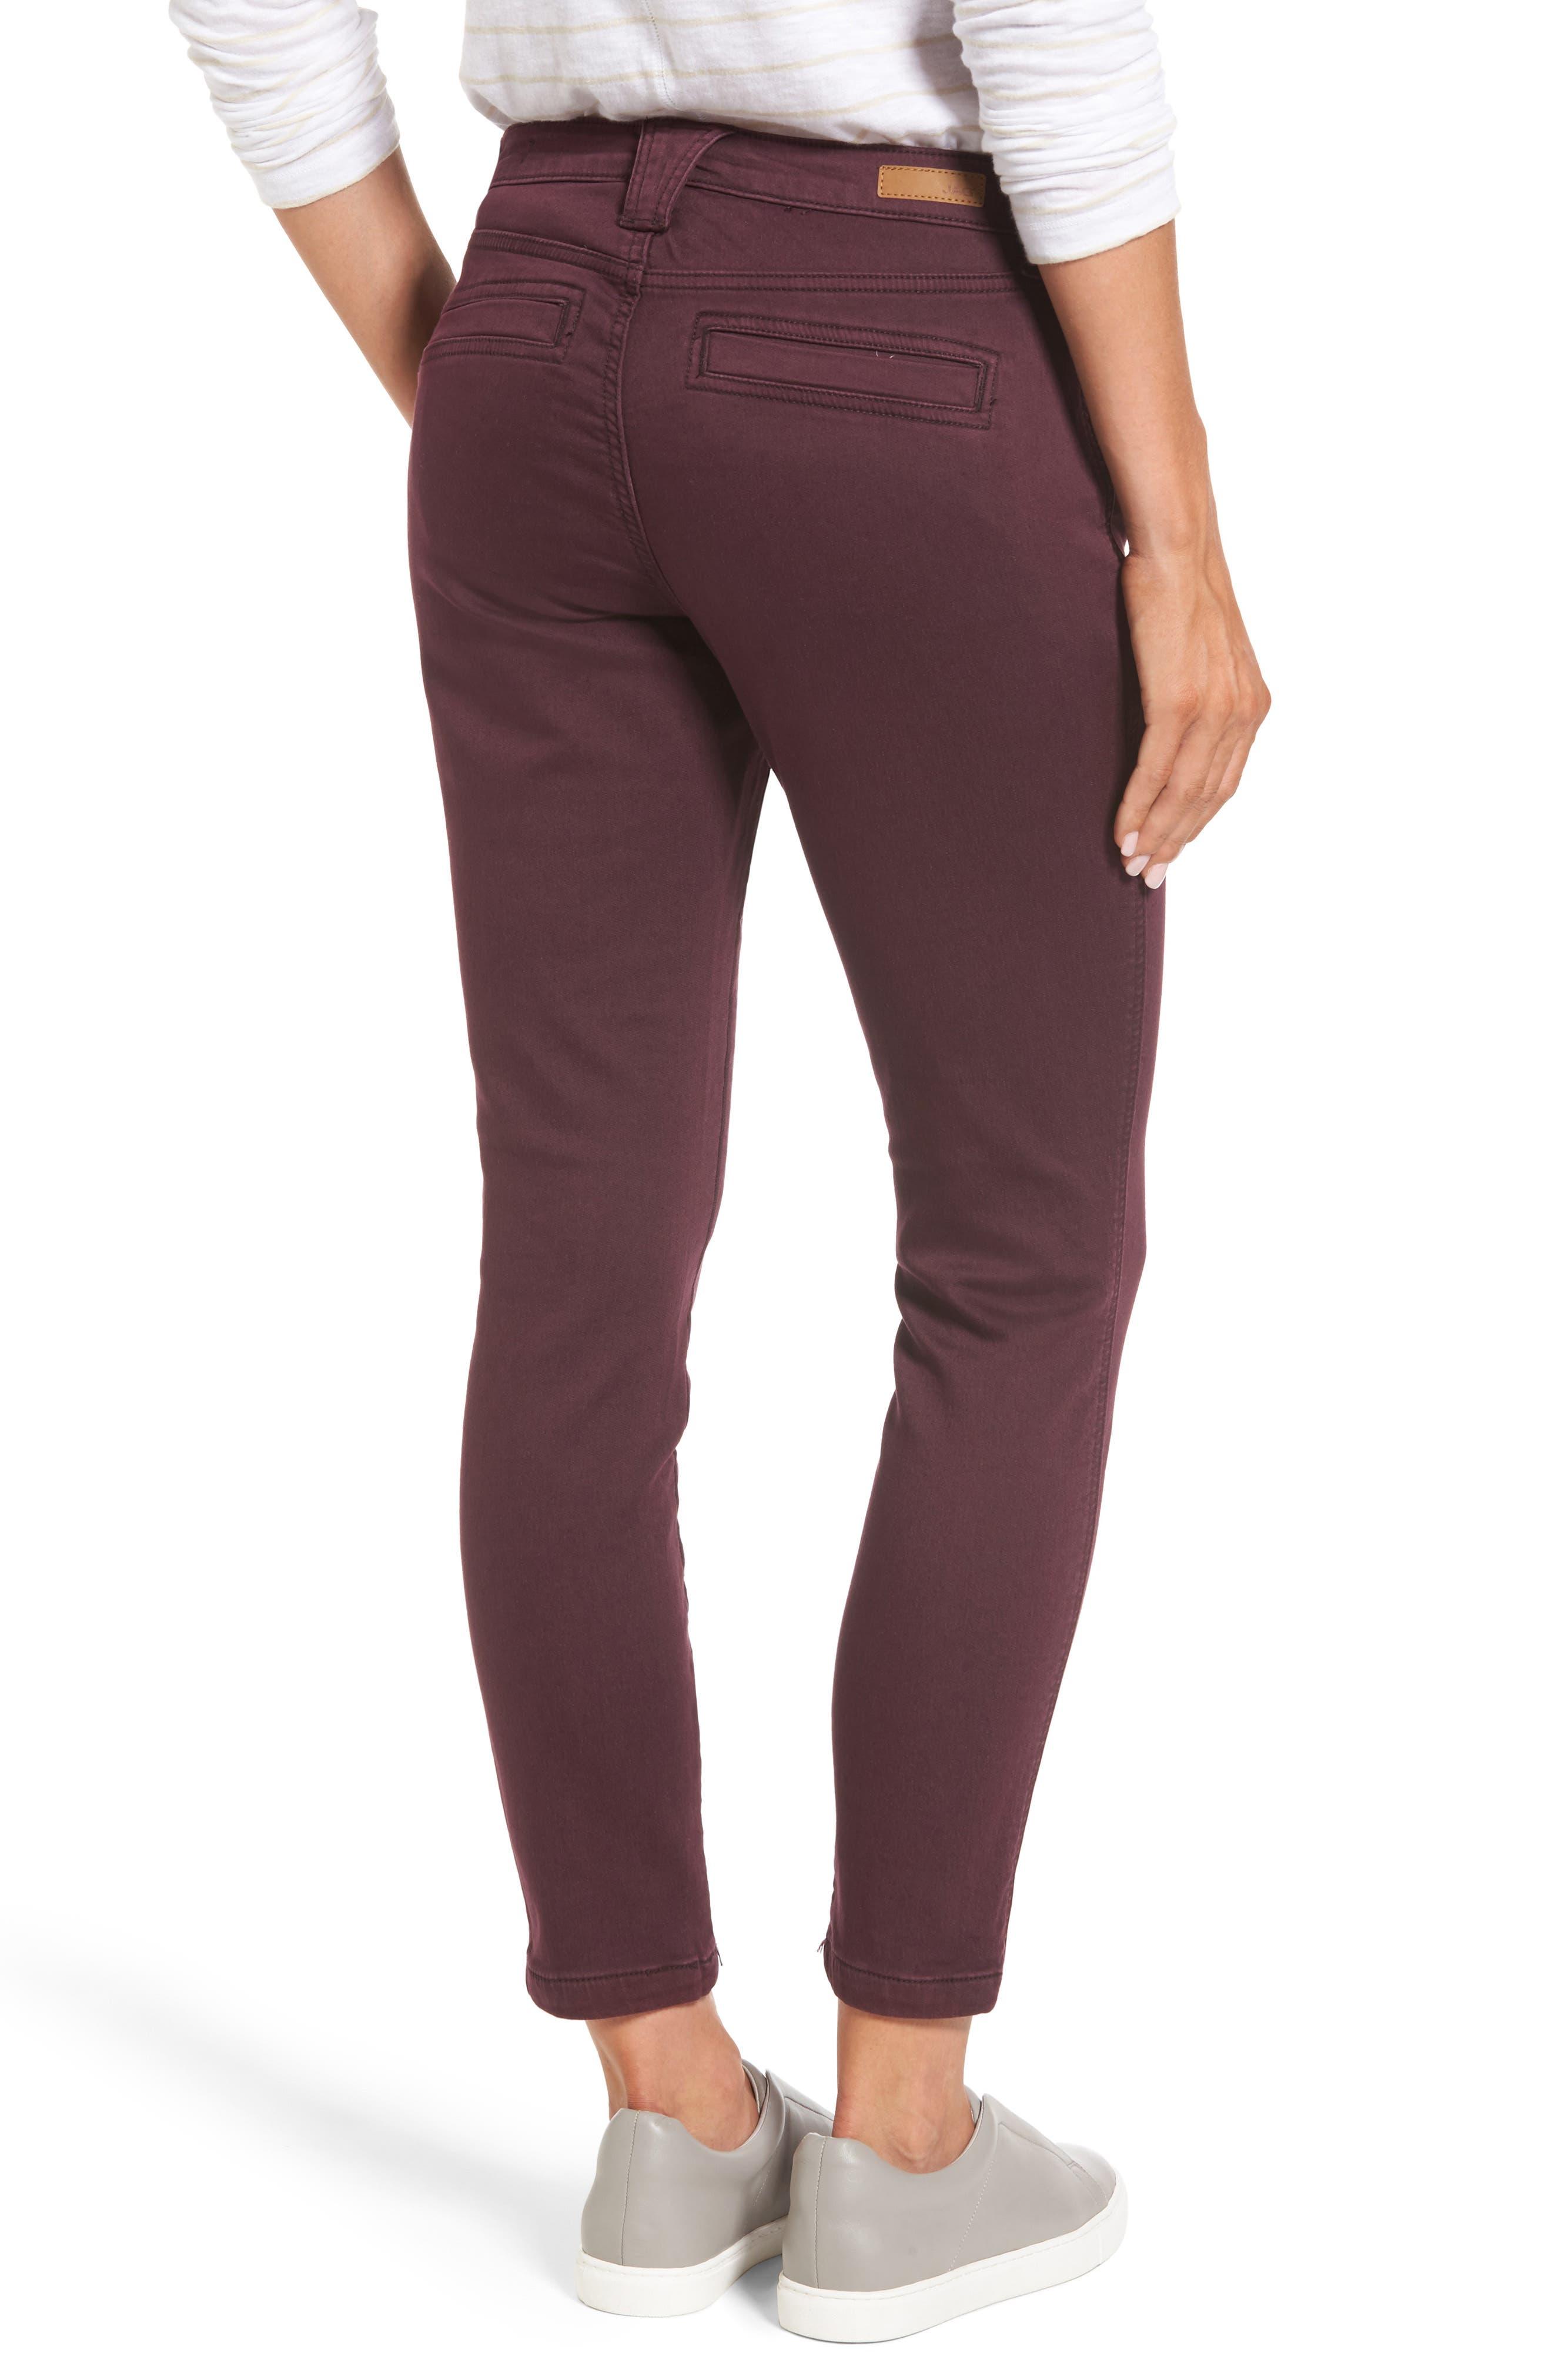 Alternate Image 2  - Jag Jeans Ryan Knit Skinny Jeans (Plum Noir)